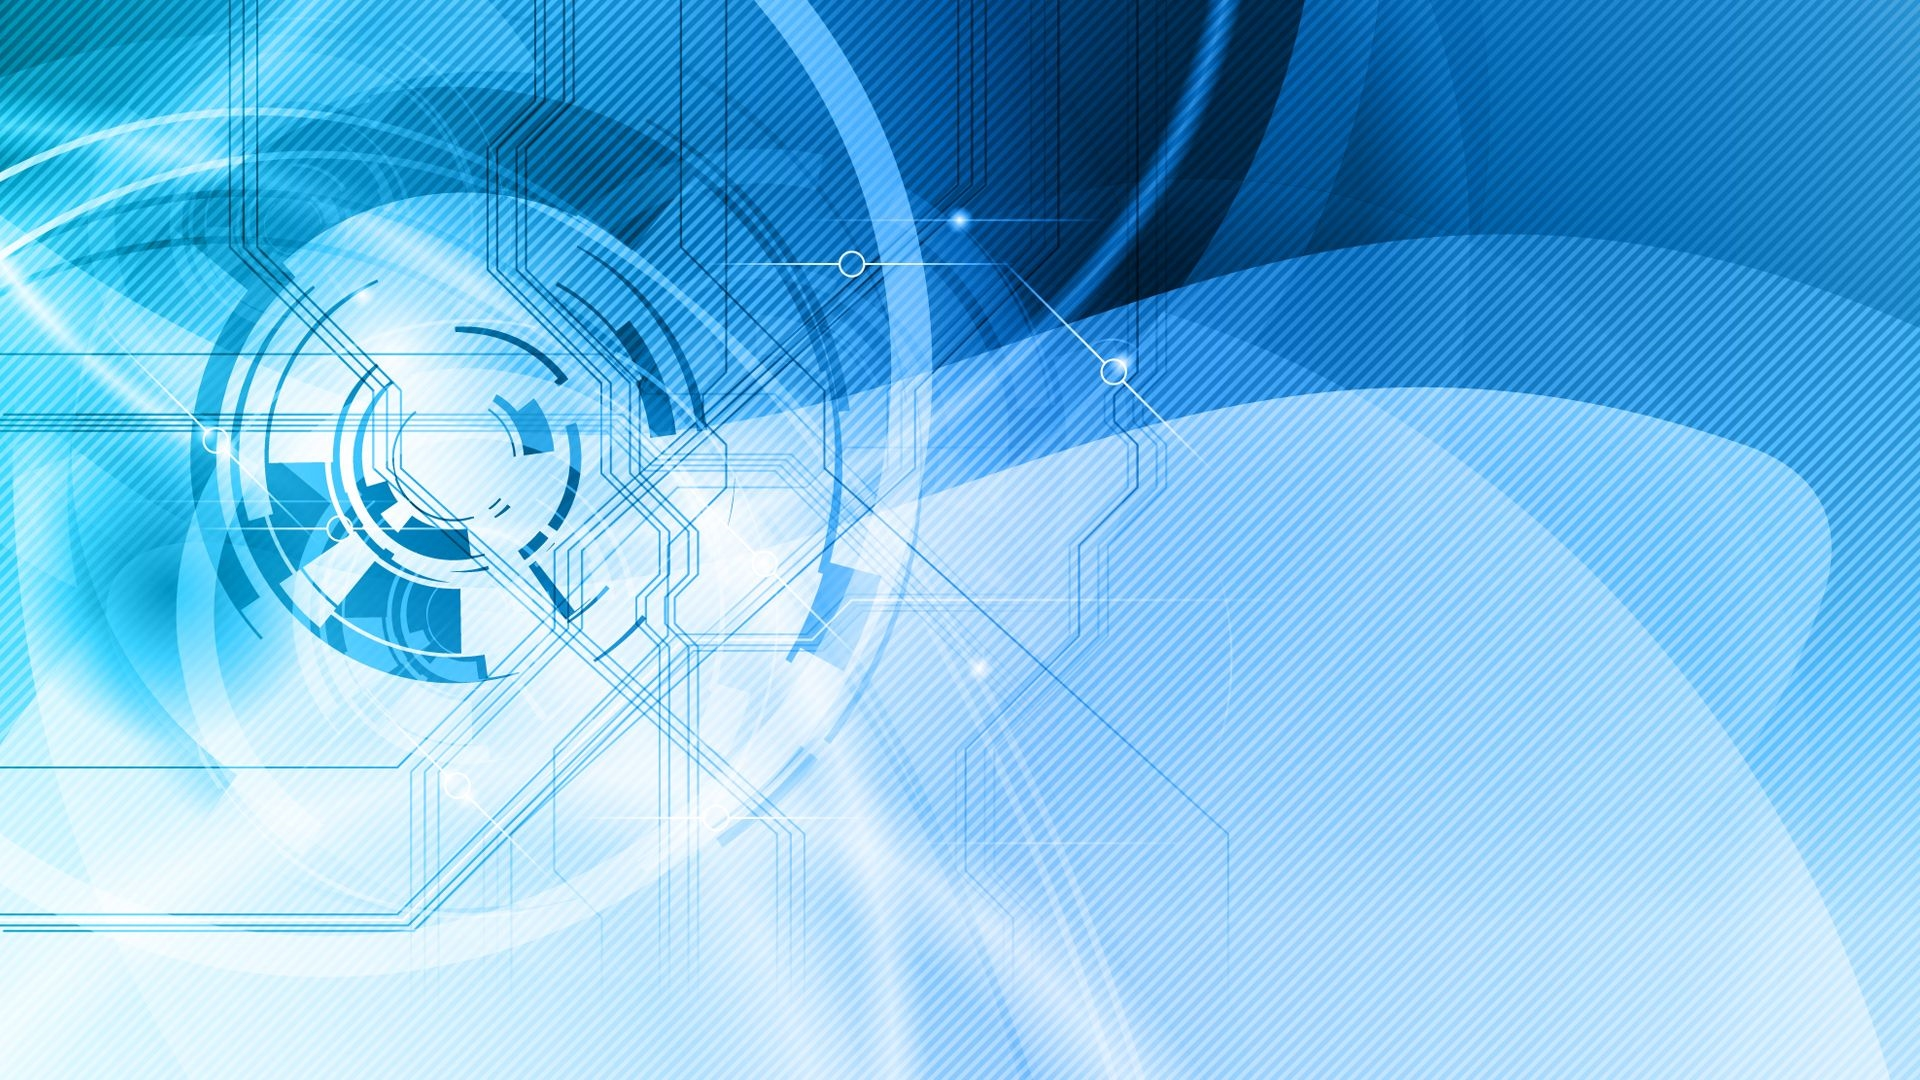 Presentation Business Style HD Wallpaper